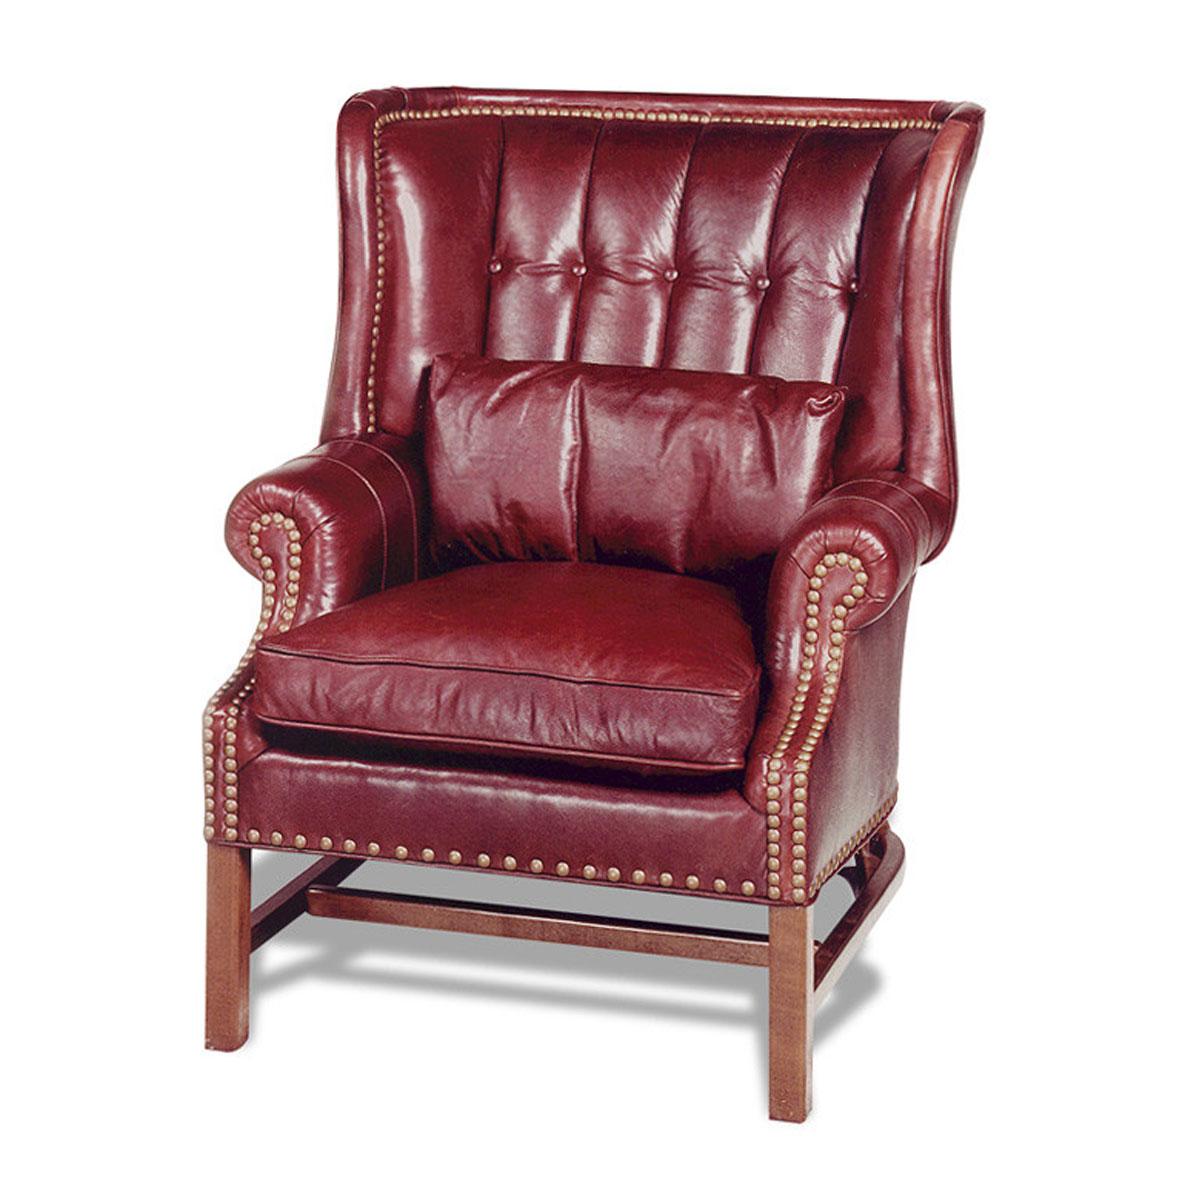 Sensational 261 Hamilton Library Wing Chair Ohio Hardwood Furniture Spiritservingveterans Wood Chair Design Ideas Spiritservingveteransorg